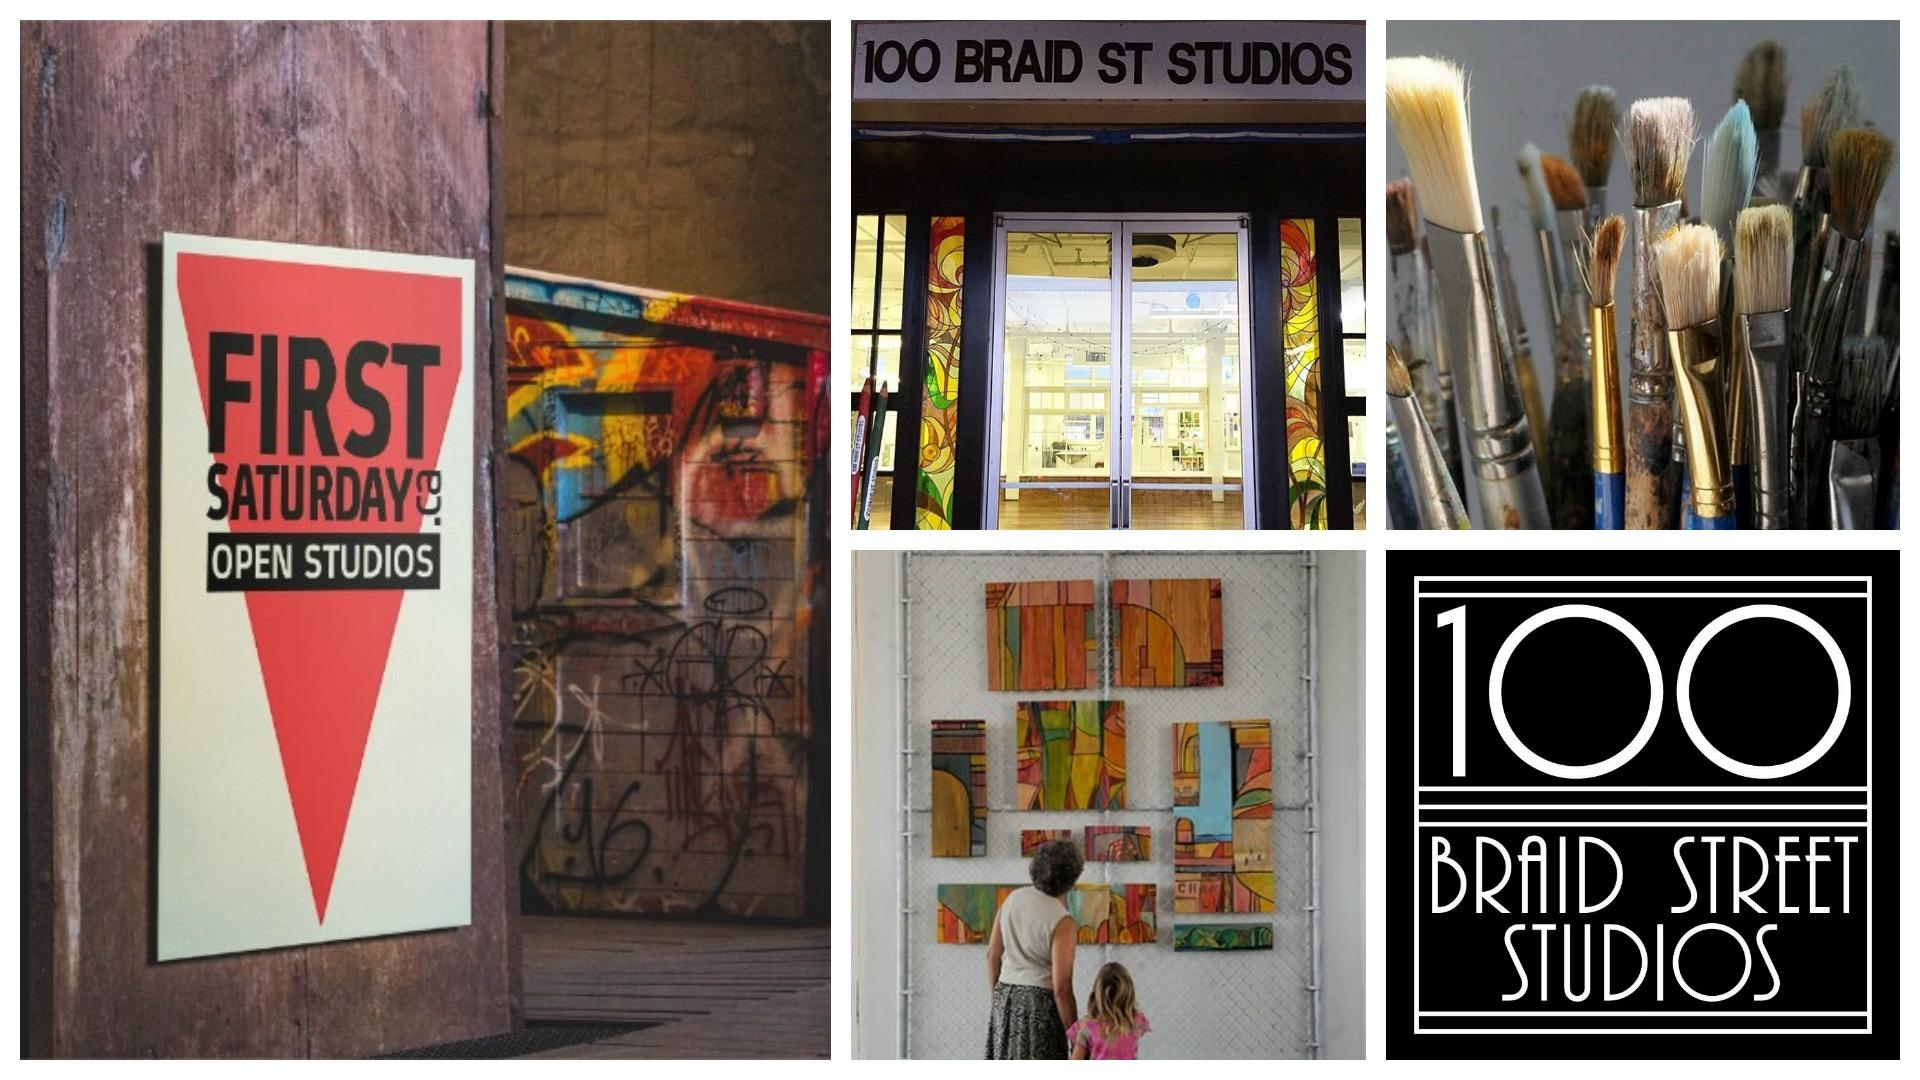 June - First Saturday Open Art Studios - COVID PROTOCOL/SOCIAL DISTANCING